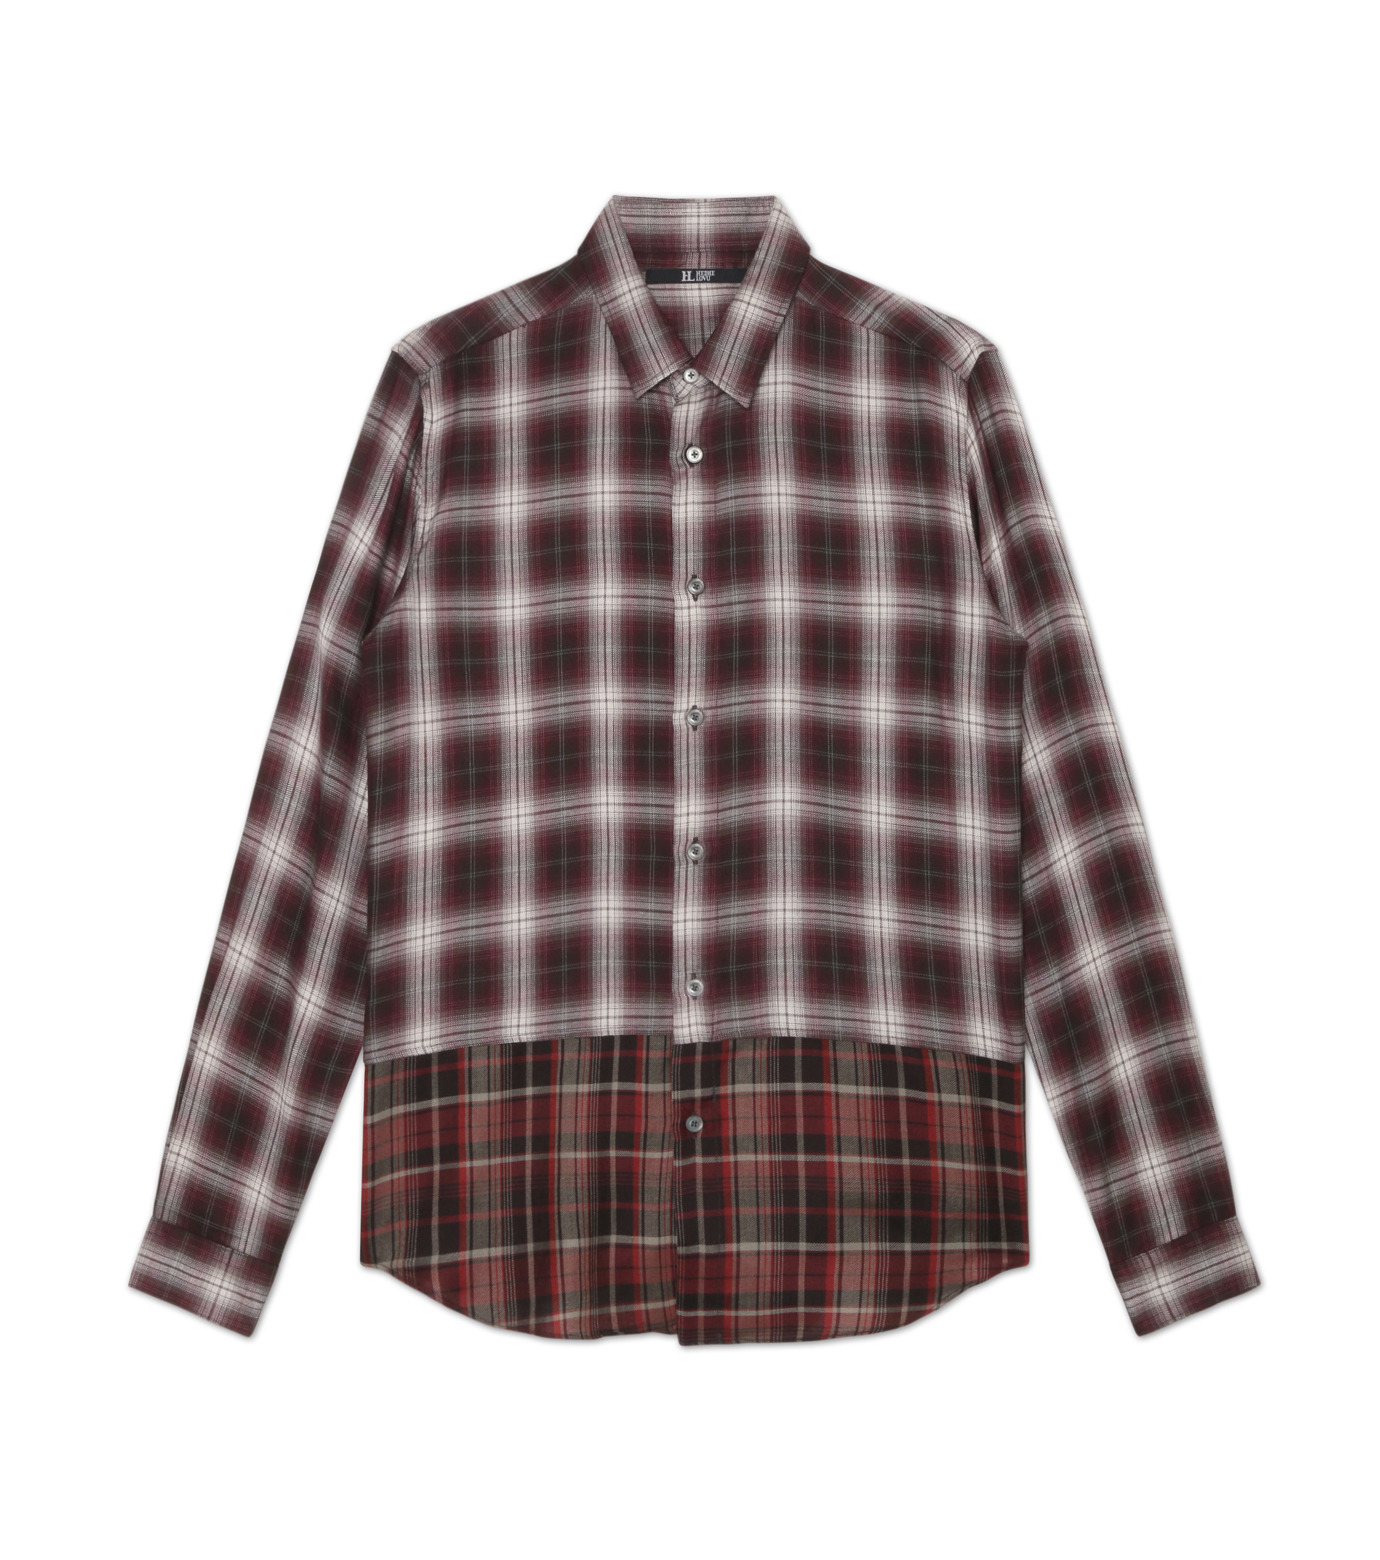 HL HEDDIE LOVU(エイチエル・エディールーヴ)のLAYERED CHECK SHIRT-BORDEAUX(シャツ/shirt)-18A93001-63 拡大詳細画像4